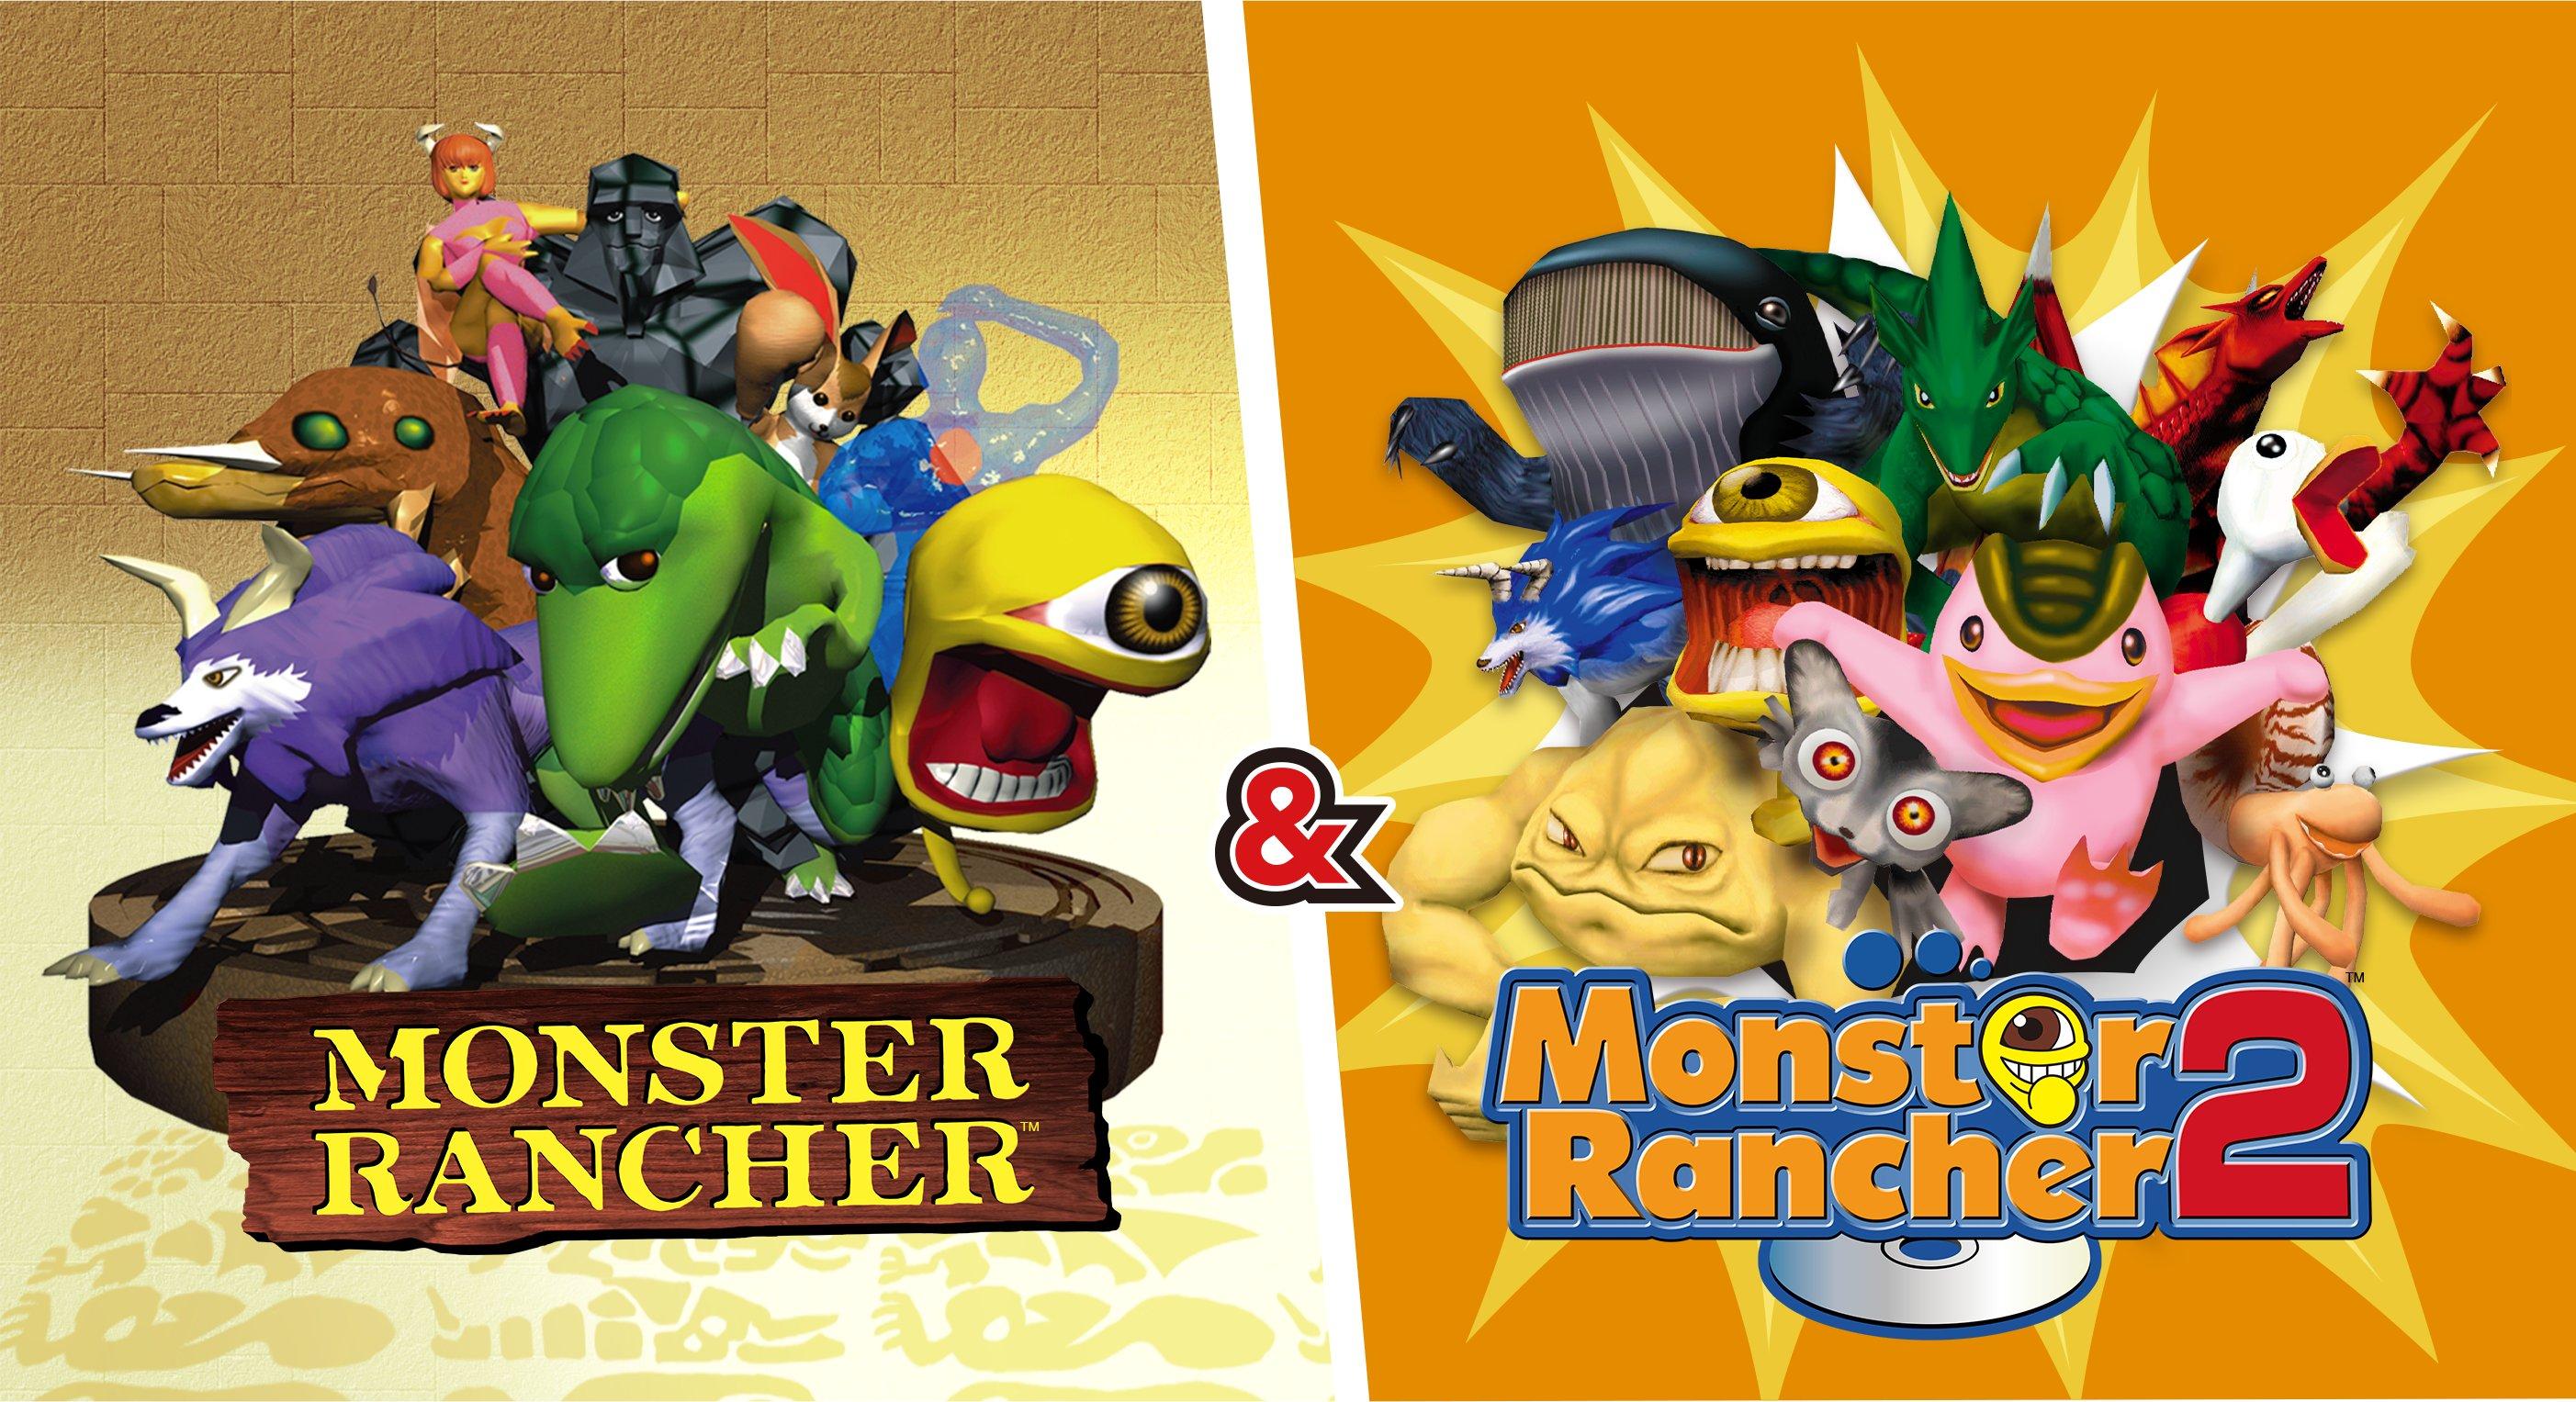 Monster Rancher 1 y 2 DX